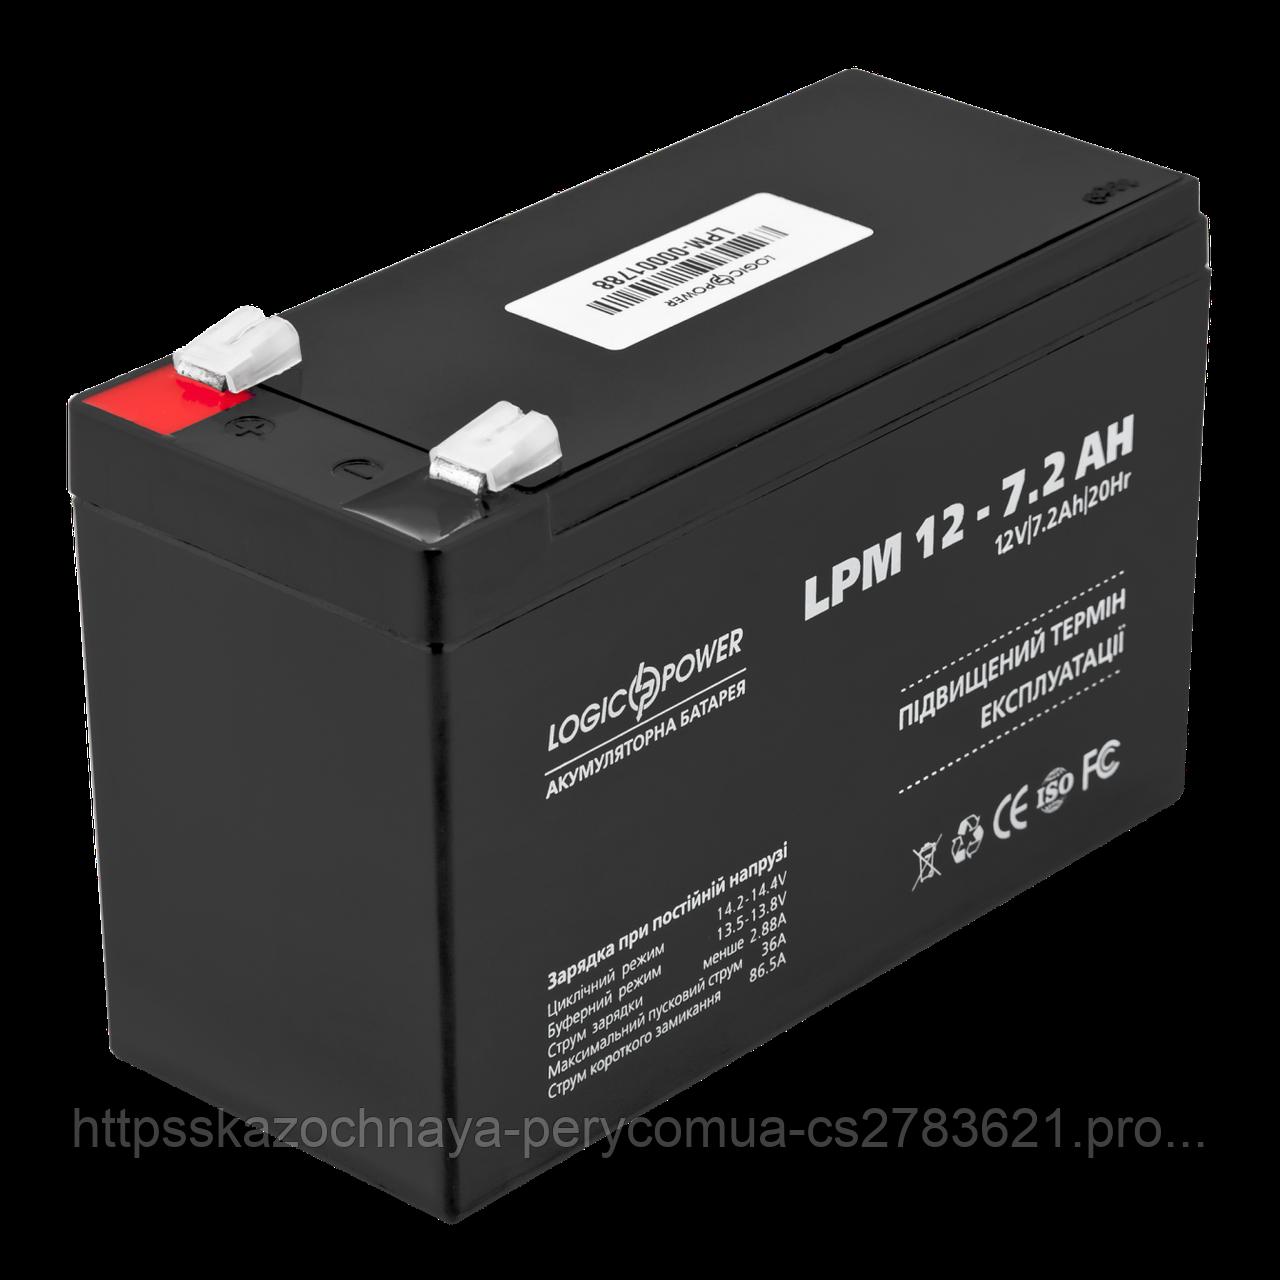 Акумулятор кислотний AGM LogicPower LPM 12 - 7,2 AH